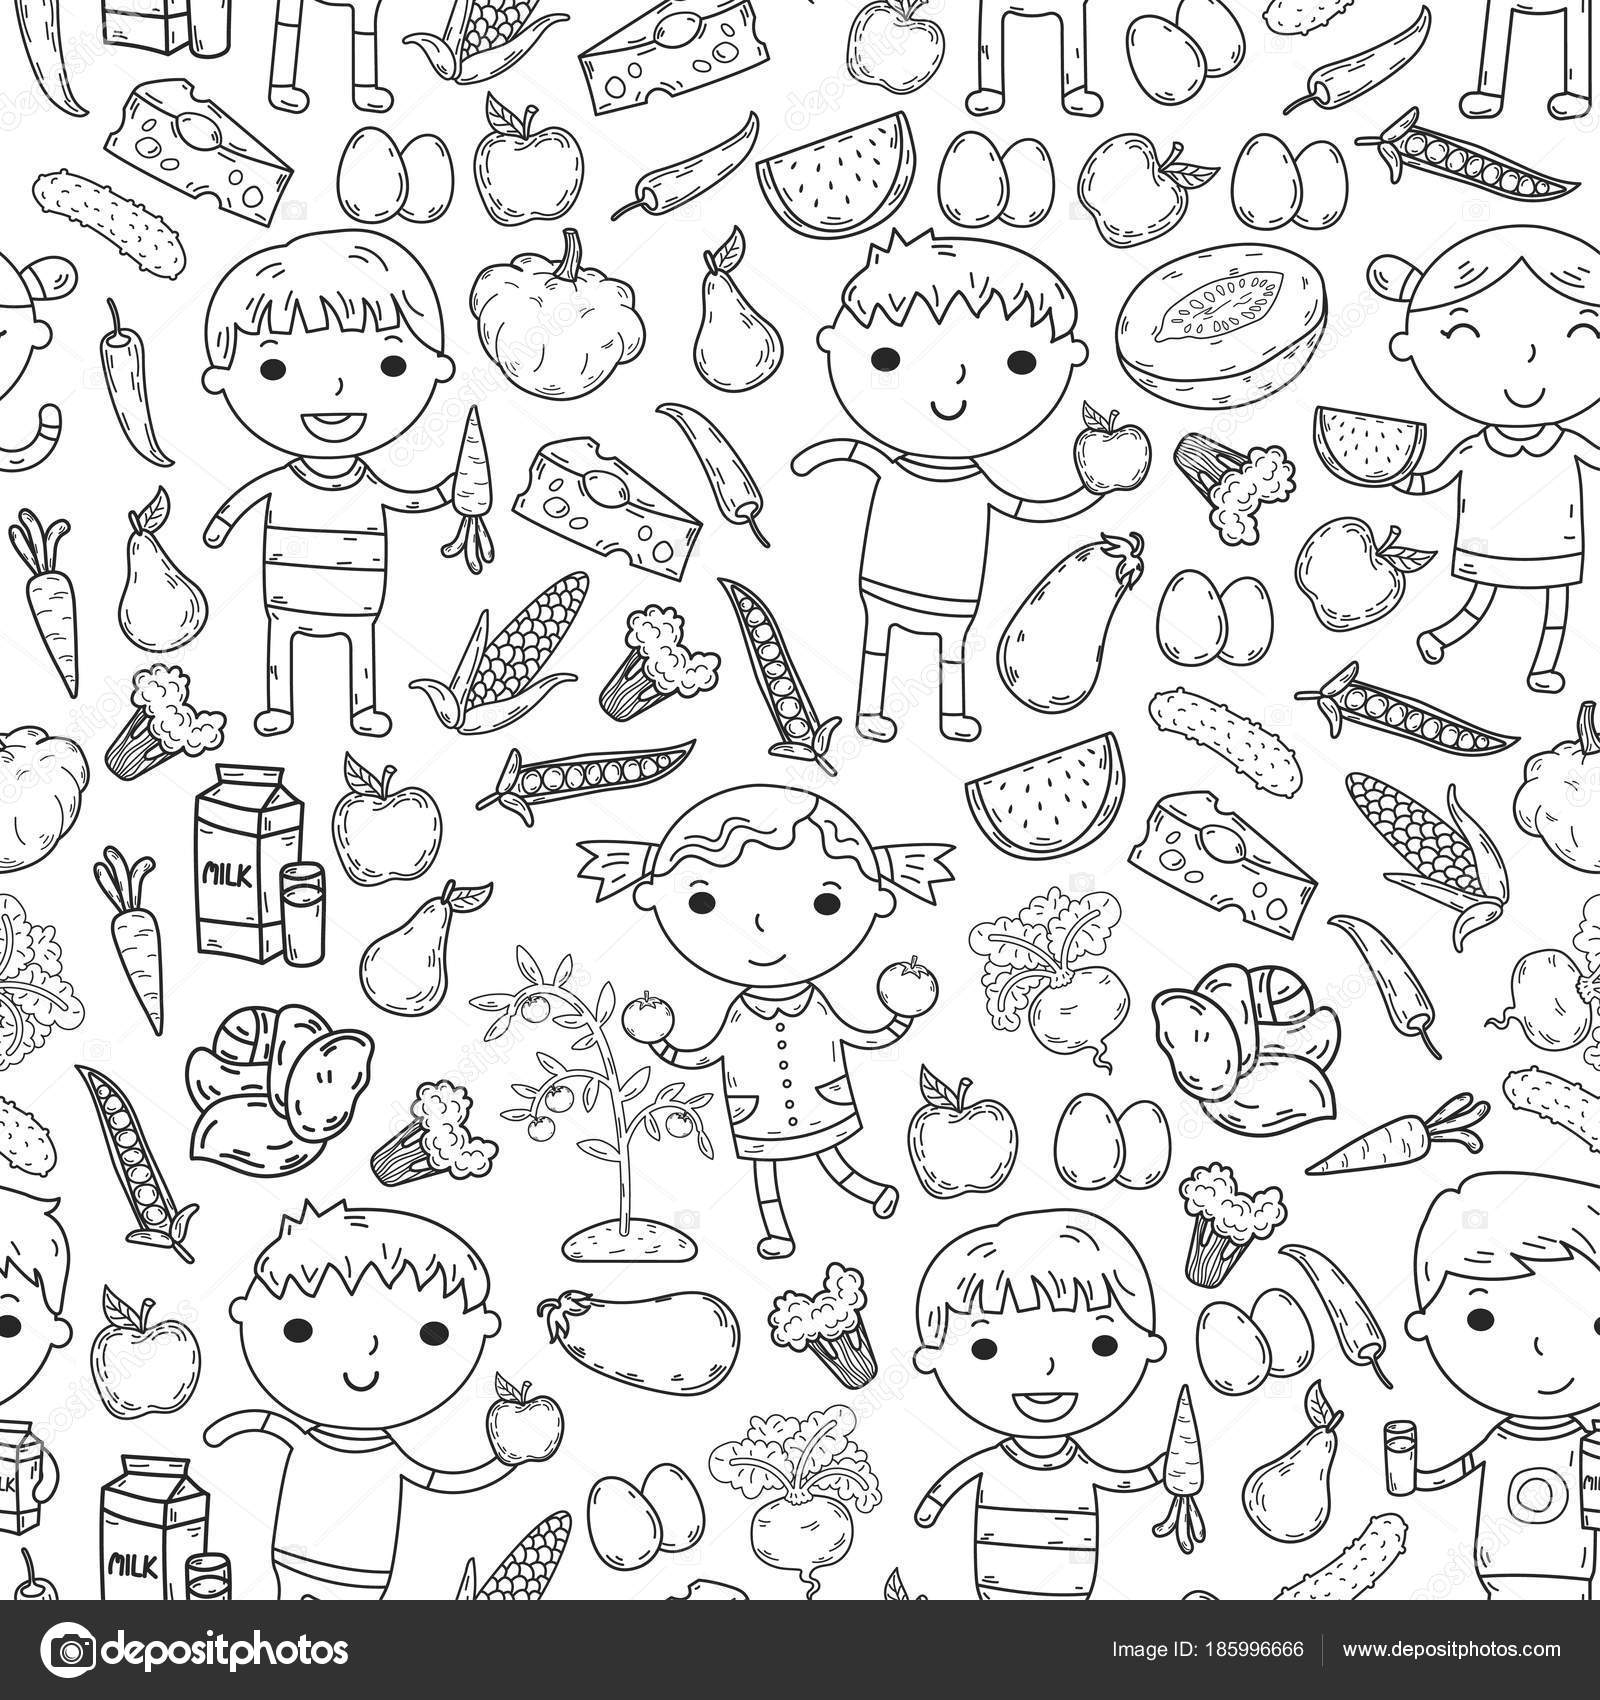 Kindergarten Nursery Preschool School Kids Eat Healthy Food Boys And Girls With Fruits Vegetables